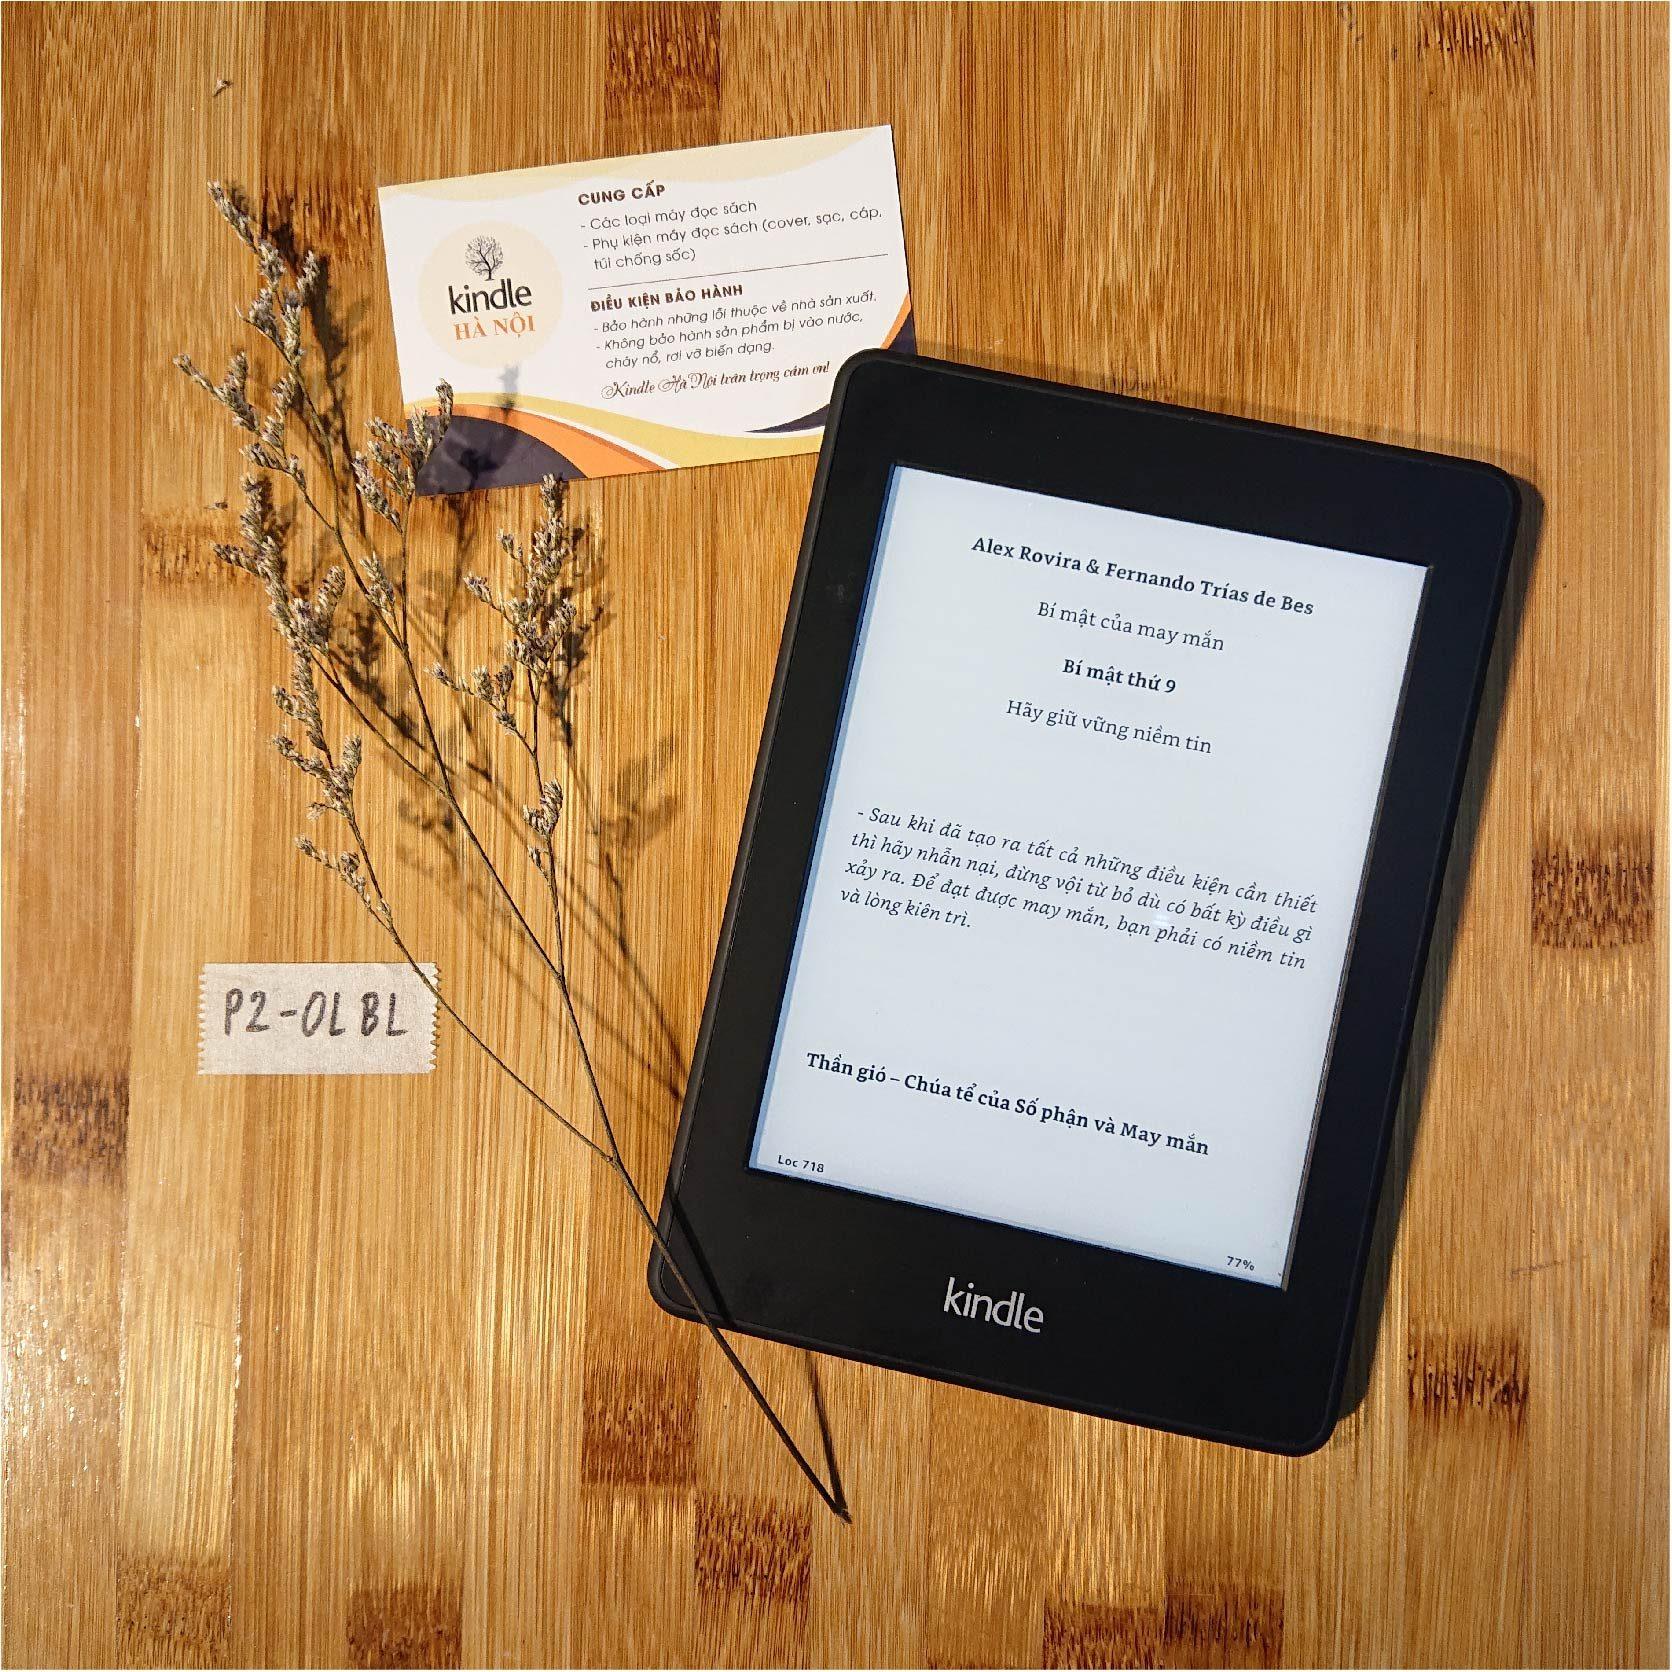 Kindle PPW2 - kindlehanoivn-01